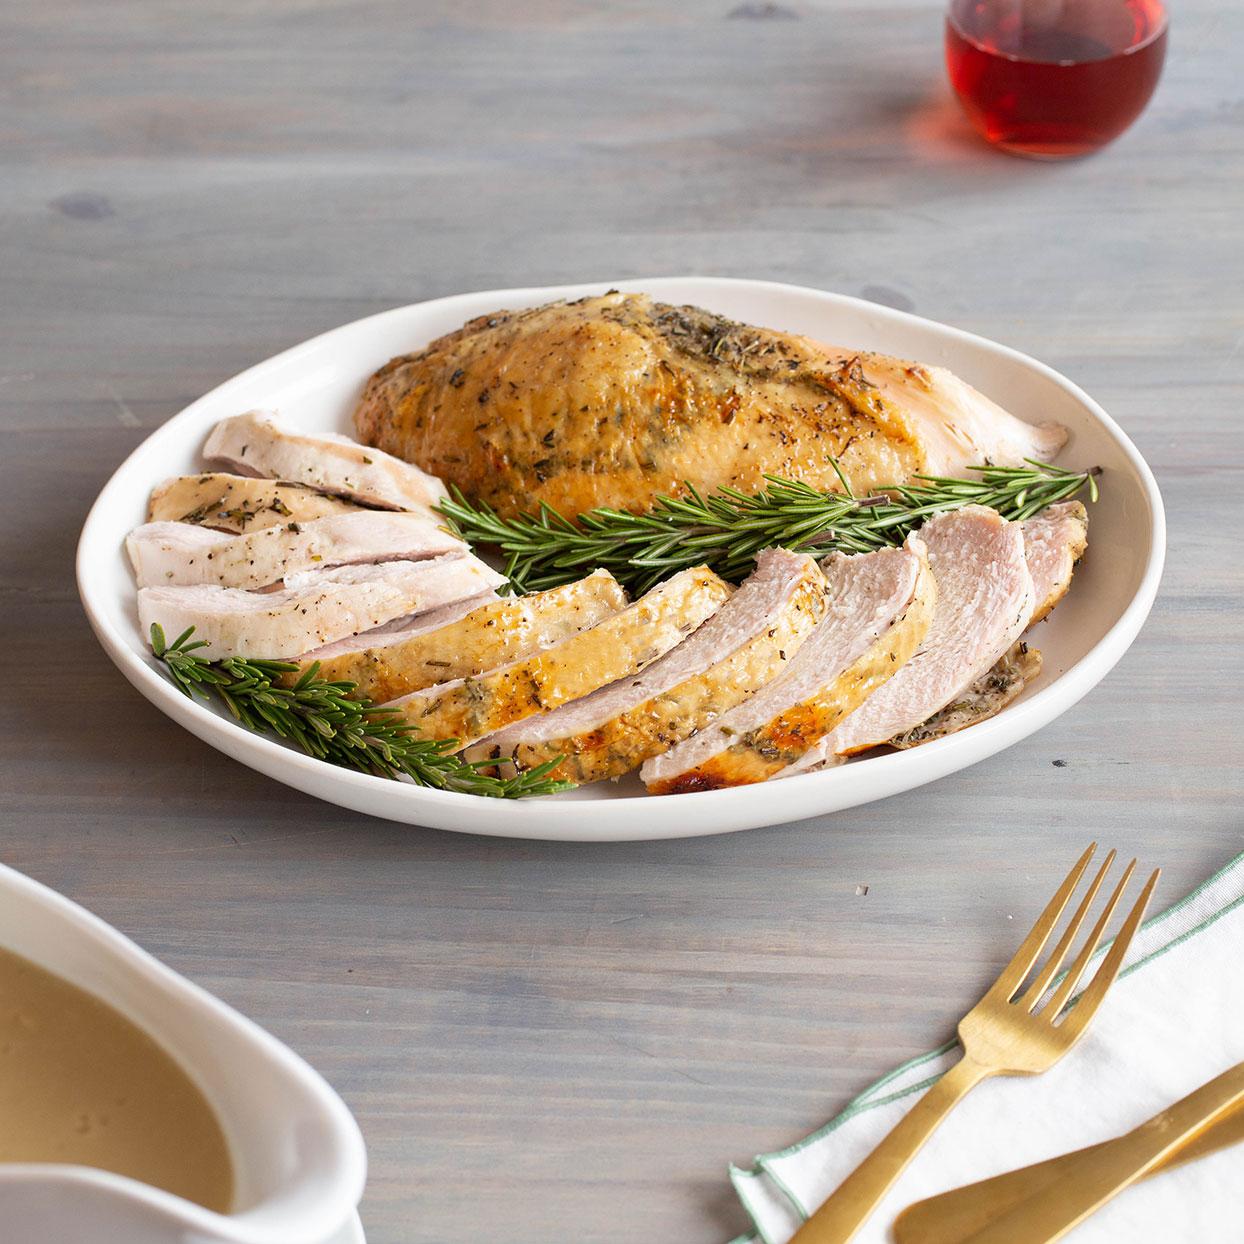 Slow-Cooker Turkey Breast Casey Barber